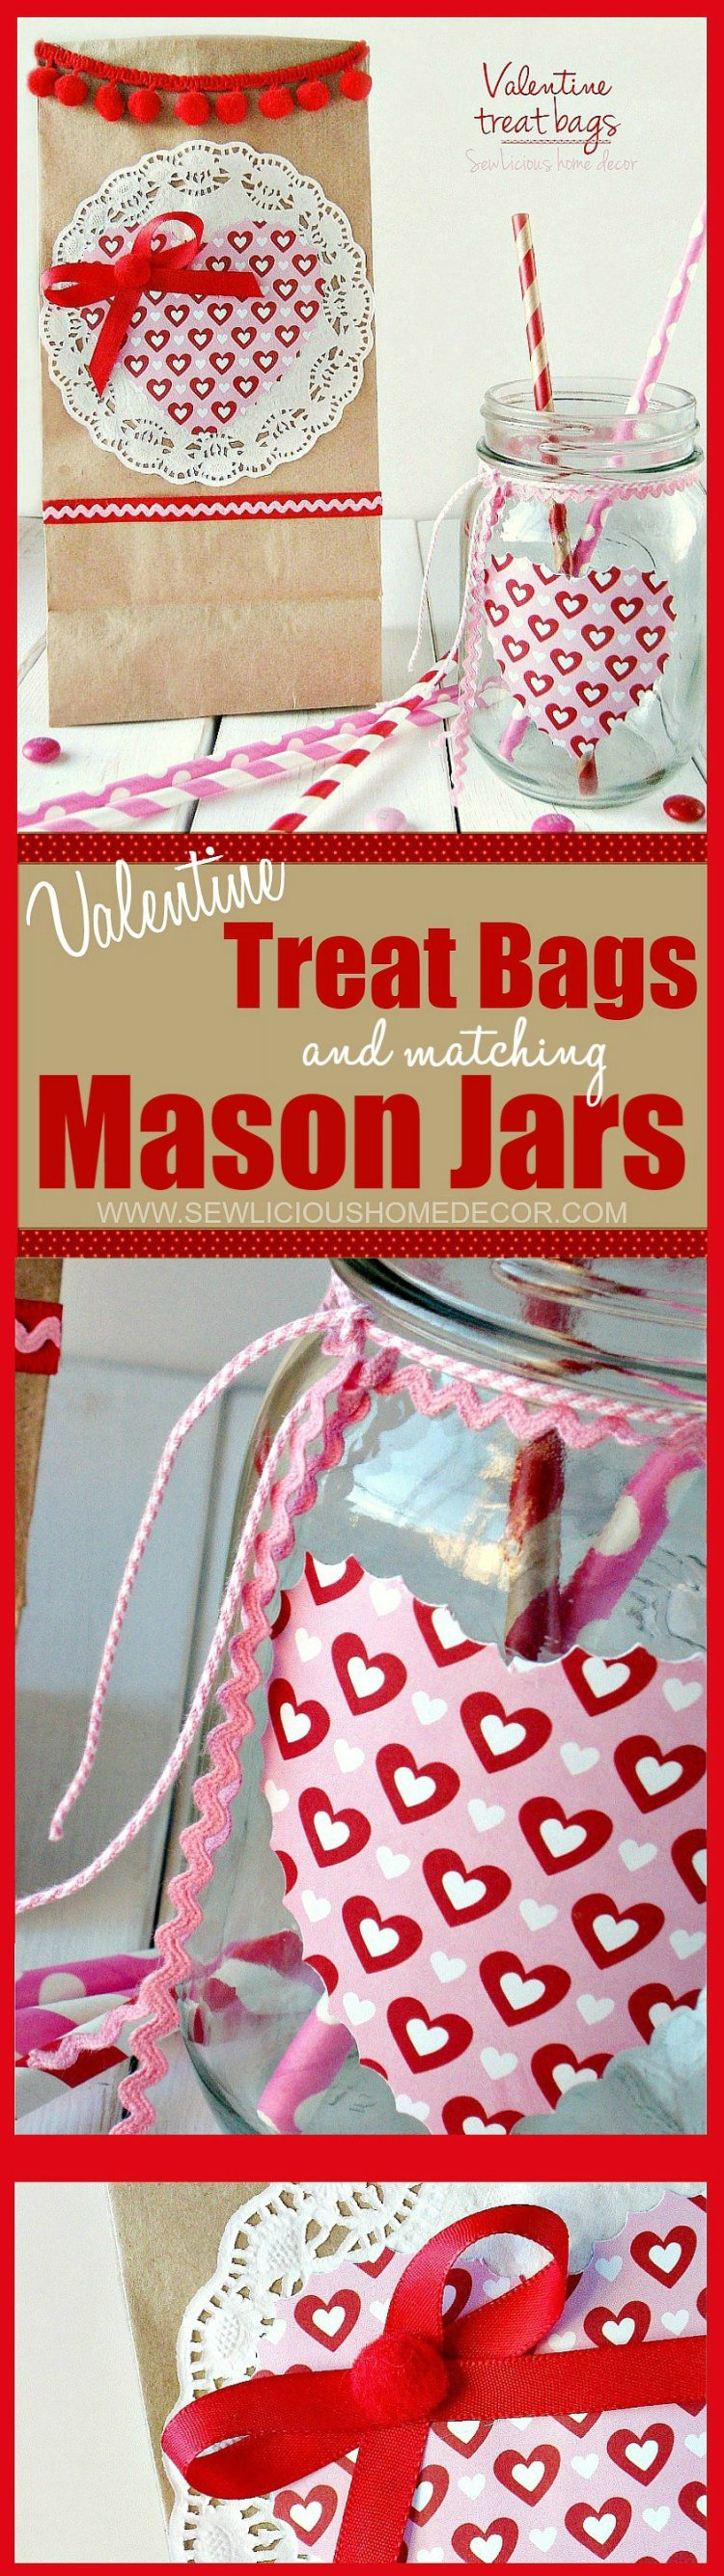 How To Make Valentine Treat Bags with Matching Mason Jars at sewlicioushomedecor.com